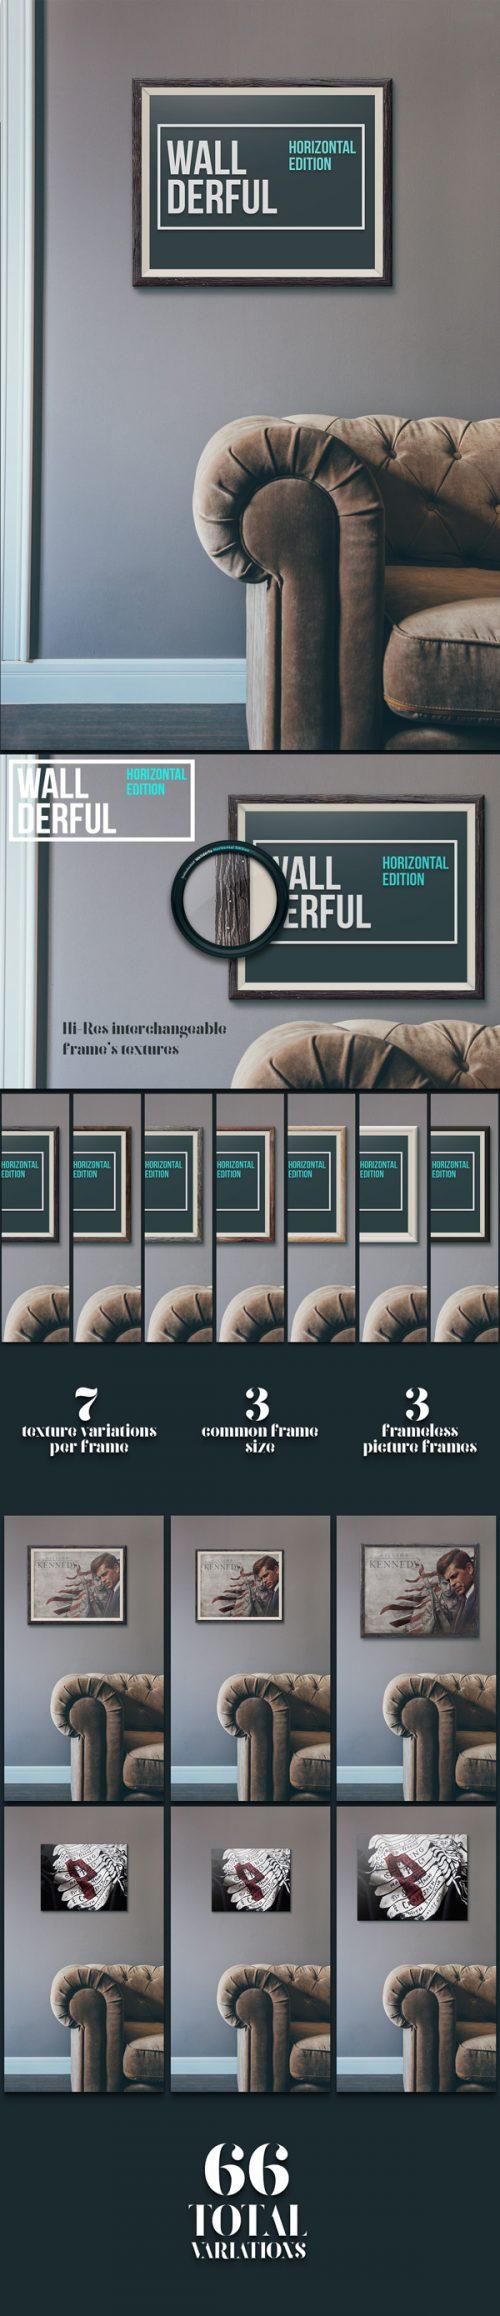 Asset | Wallderful: Horizontal Frames MockUps